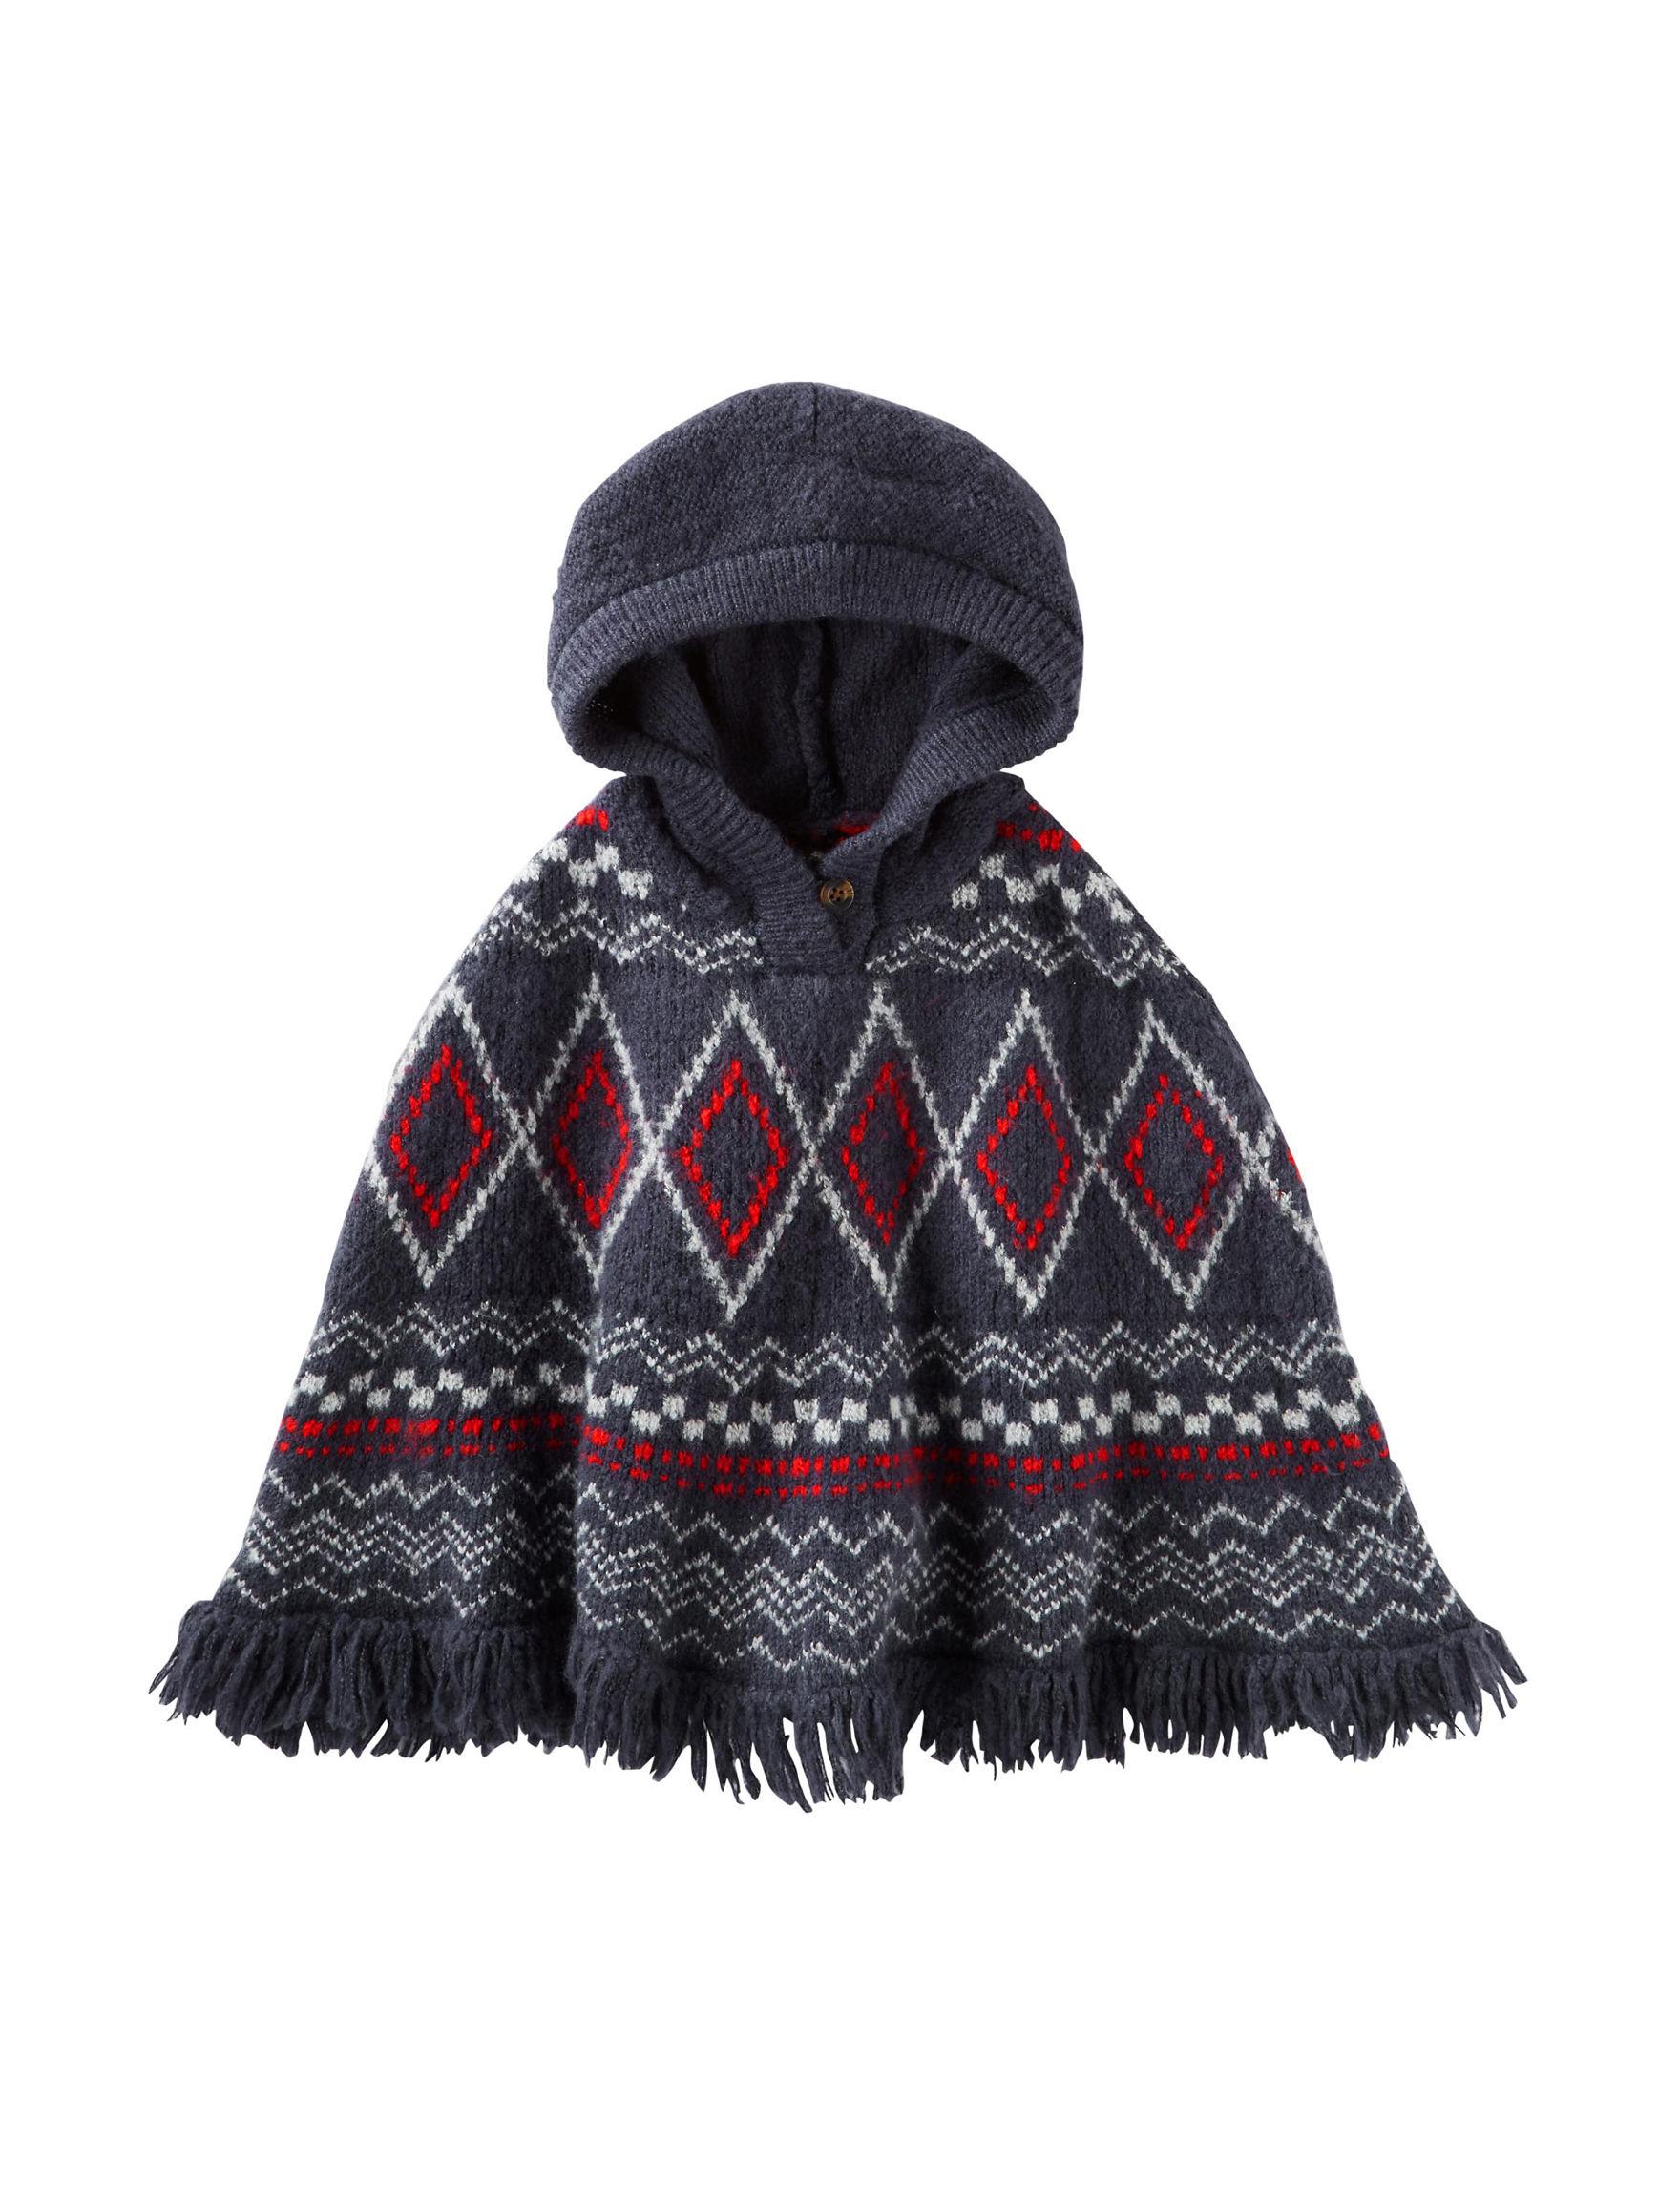 Oshkosh B'Gosh Print Ponchos Sweaters